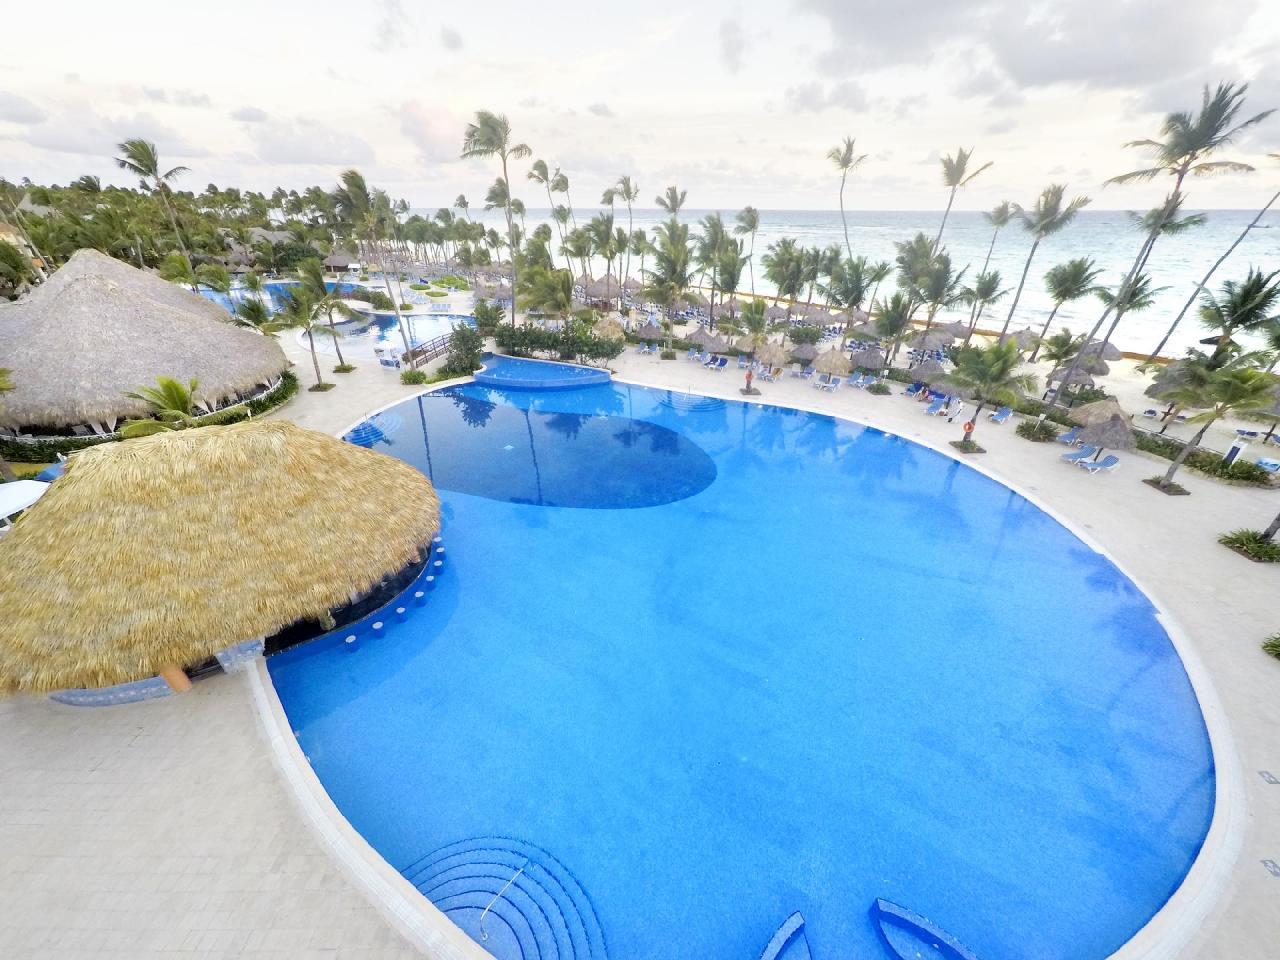 Фото бассейна в Grand Bahia Principe Bavaro 5*